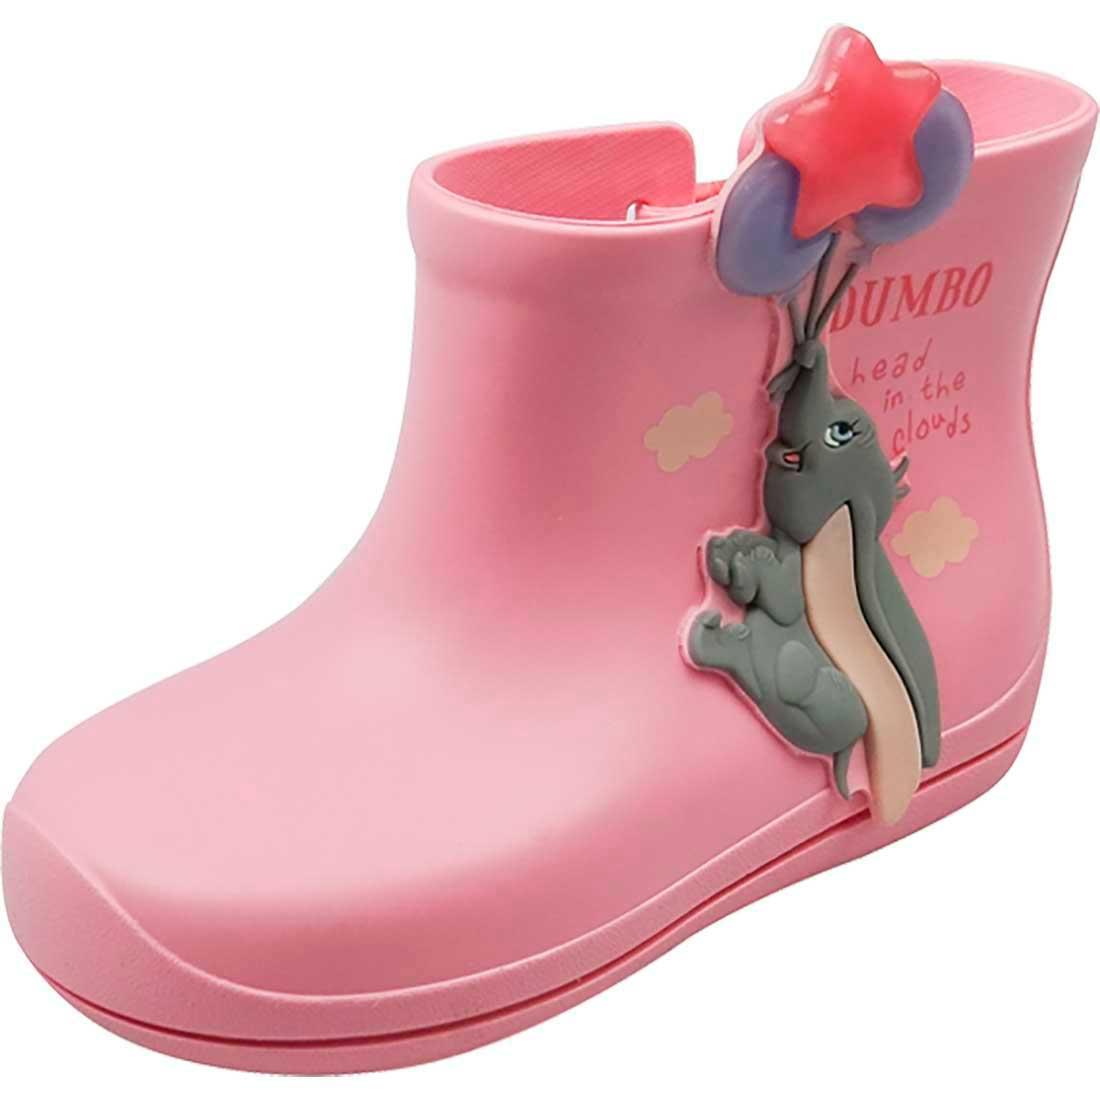 Galocha Disney Baby Dumbo - Rosa